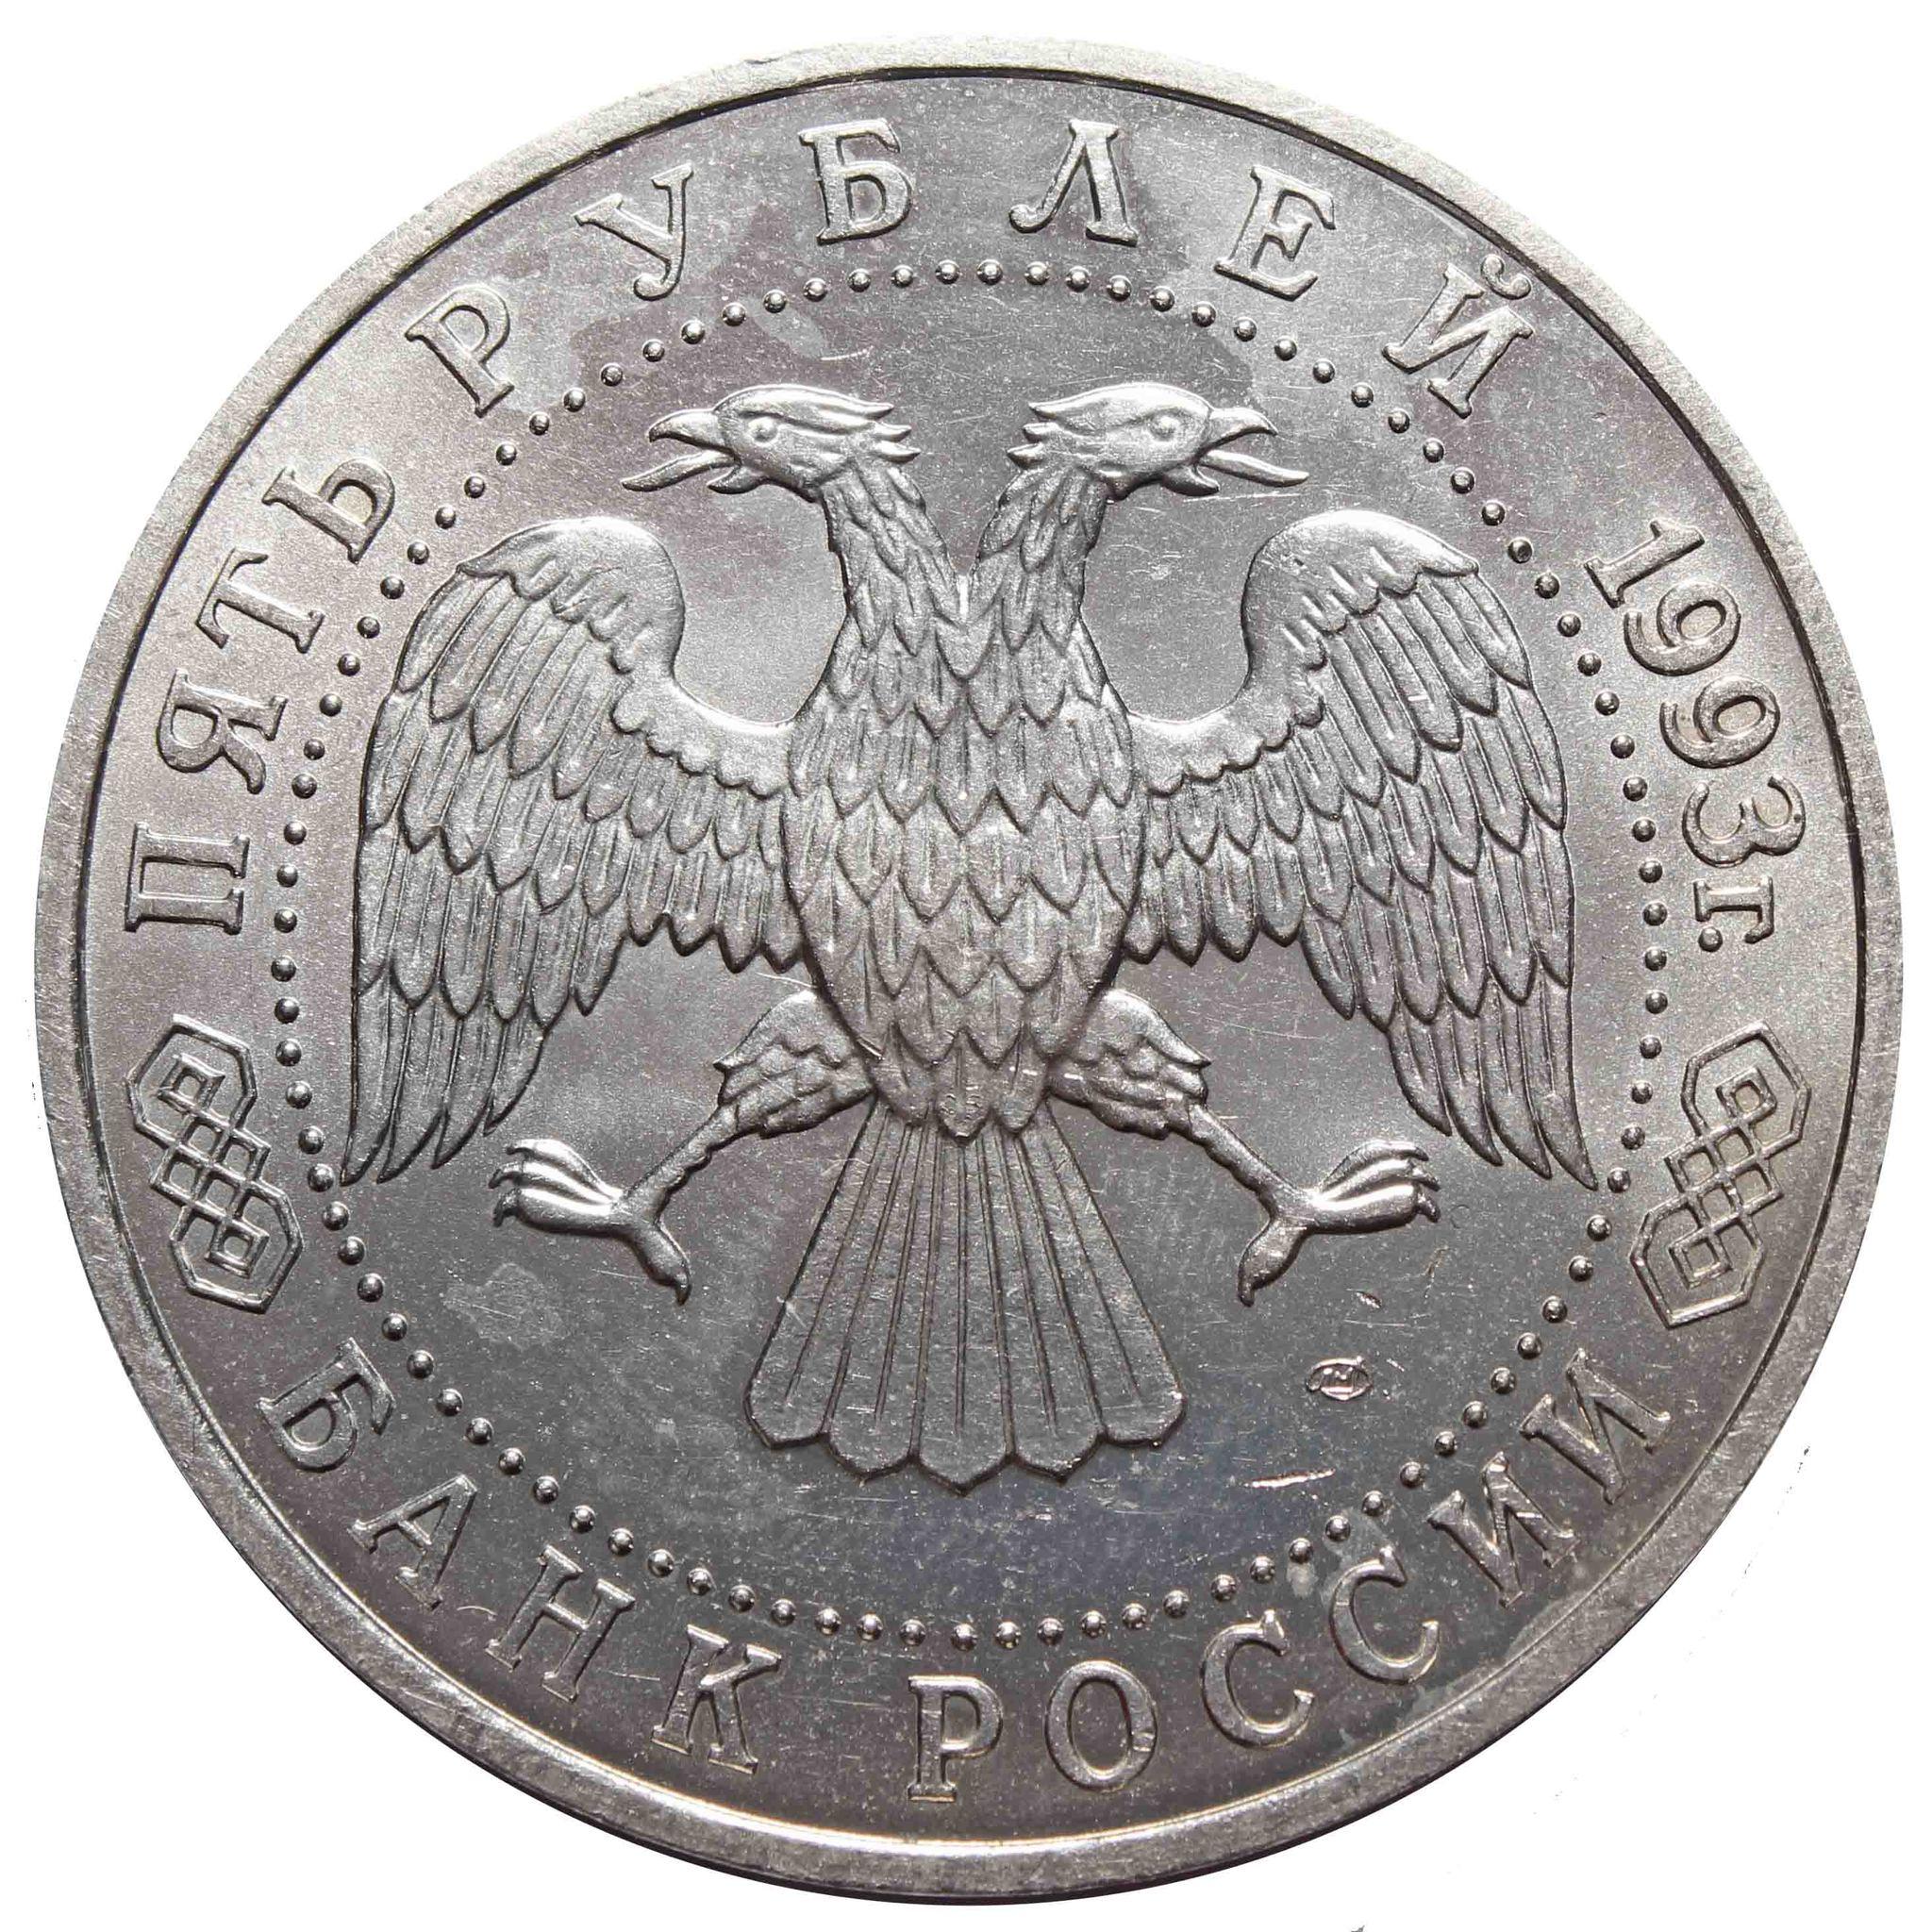 (ац) 5 рублей